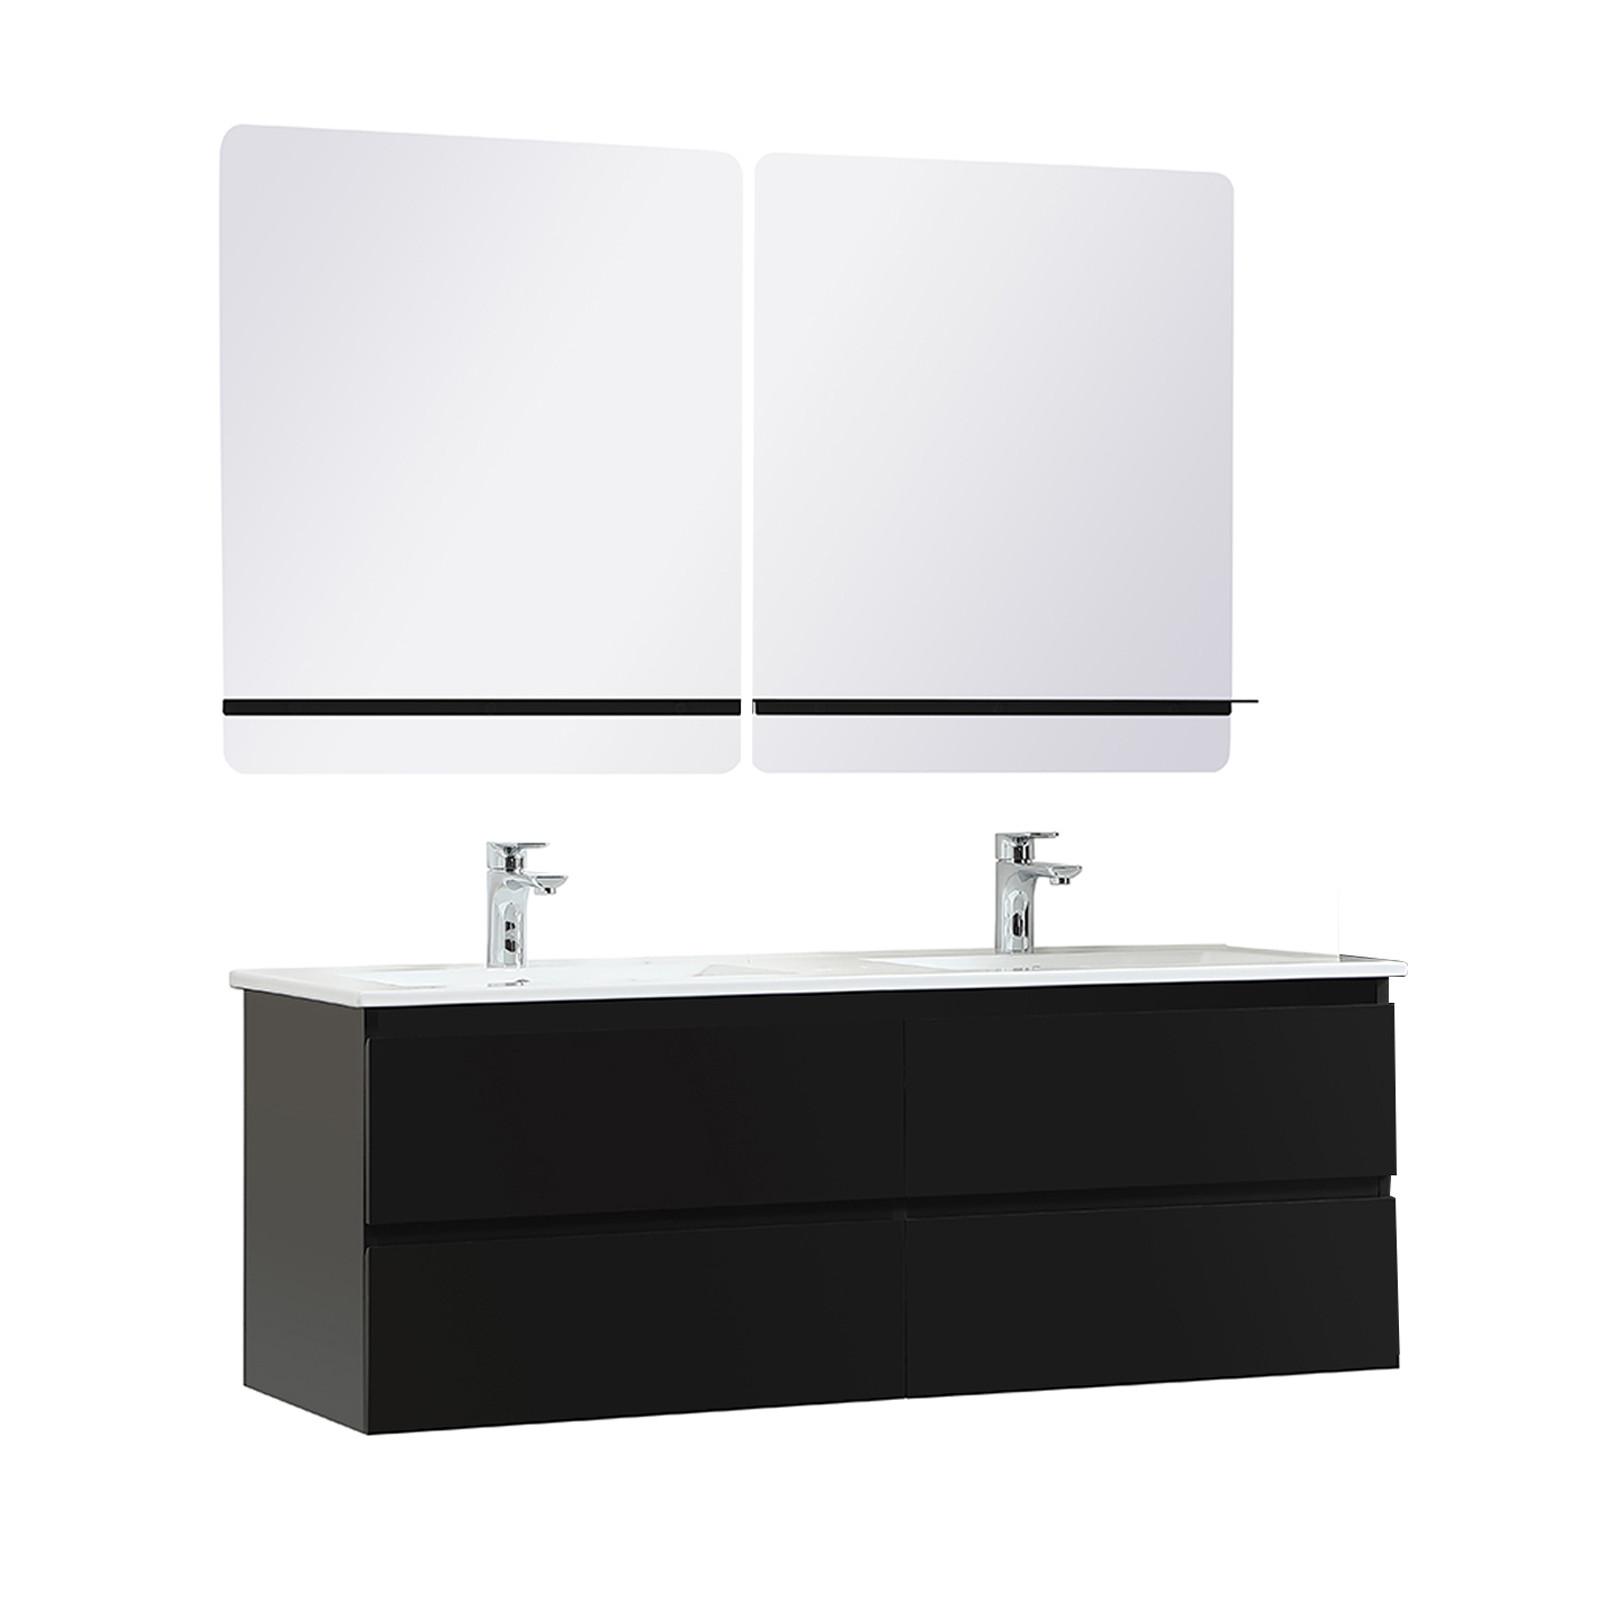 Meuble de Salle de Bain Double Vasque 120 cm Noir Carbone + 2 miroirs SORRENTO